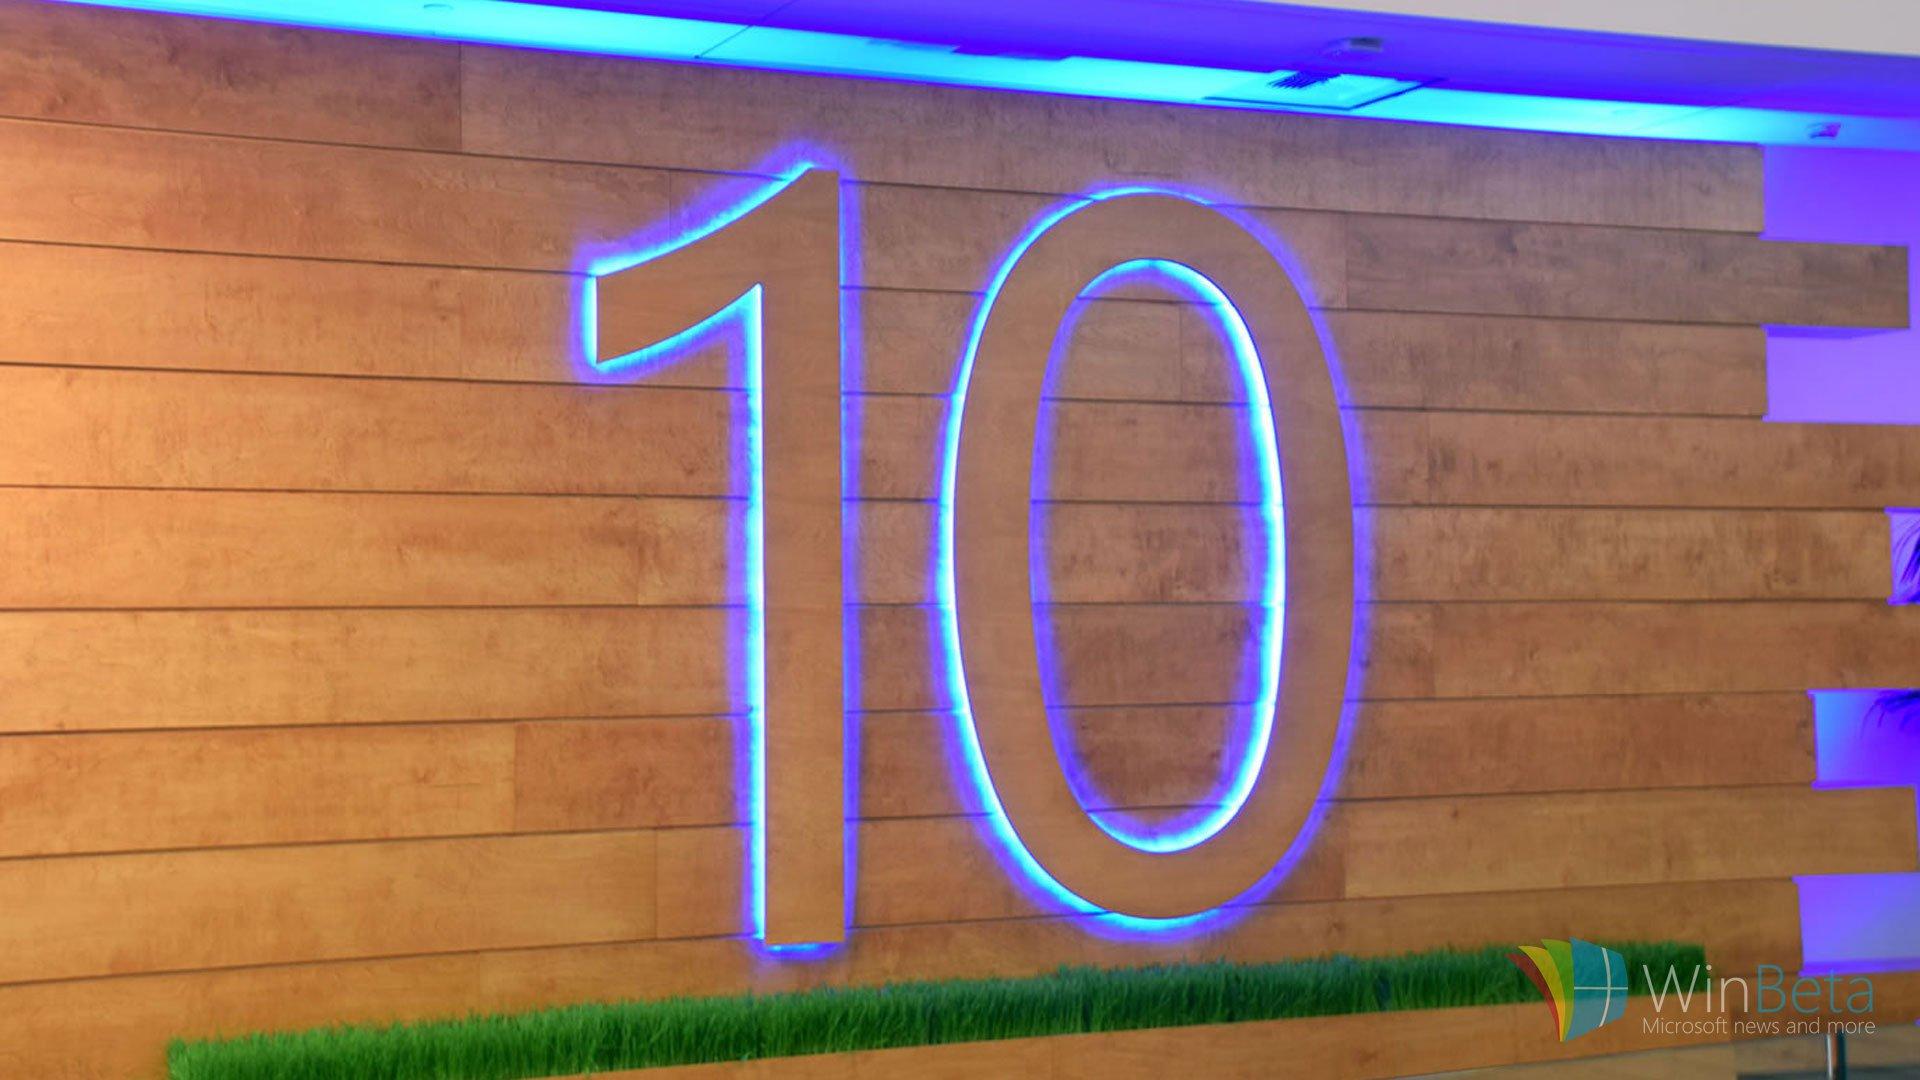 Best Windows 10 Hd Wallpaper Mytechshout